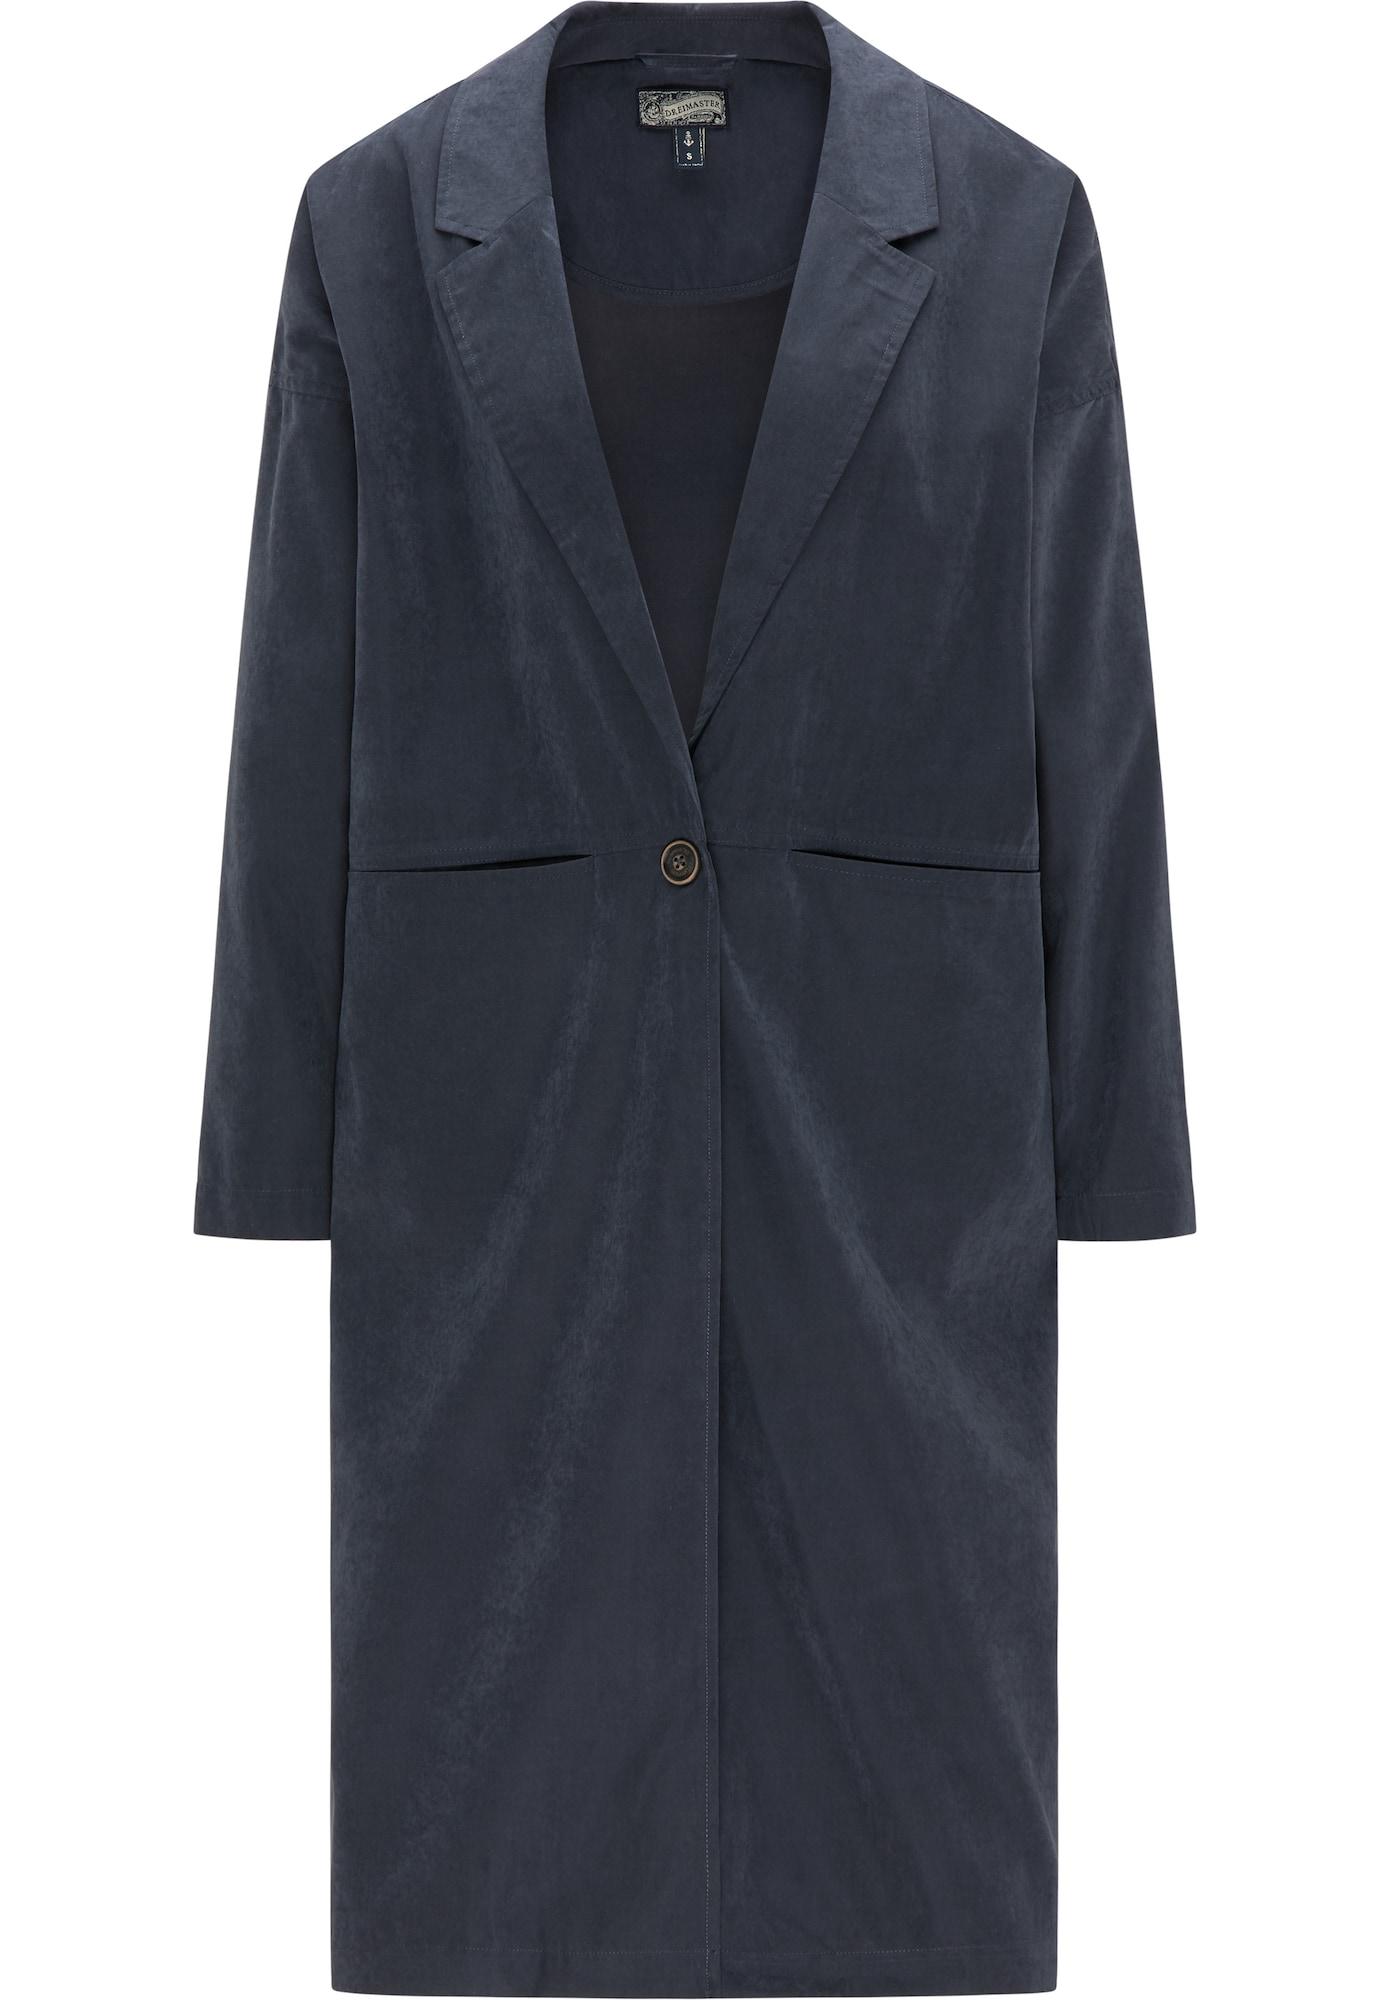 DREIMASTER Demisezoninis paltas tamsiai mėlyna